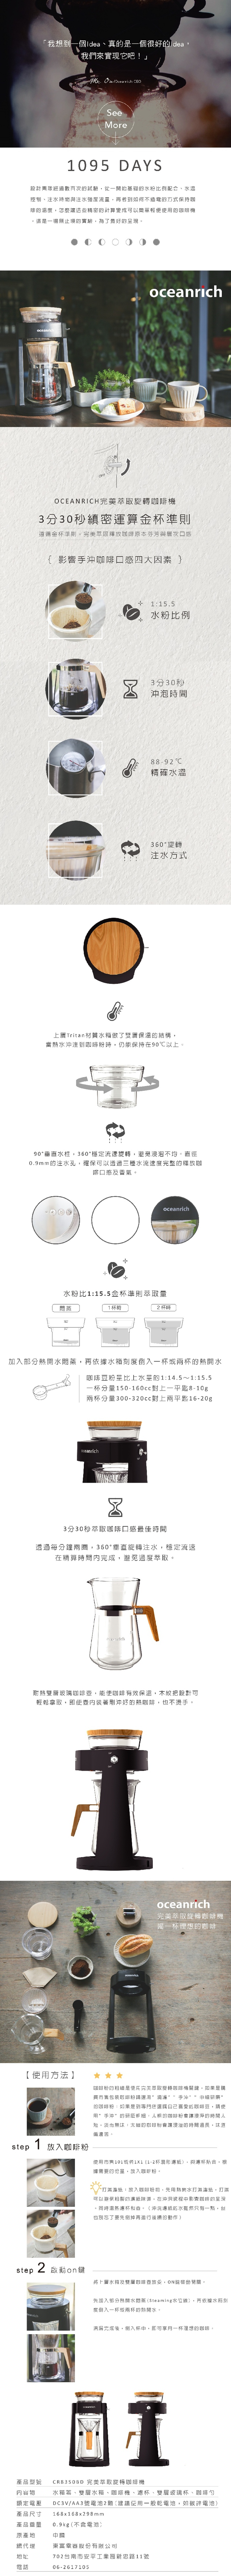 Oceanrich|完美萃取旋轉咖啡機CR8350BD(白色)